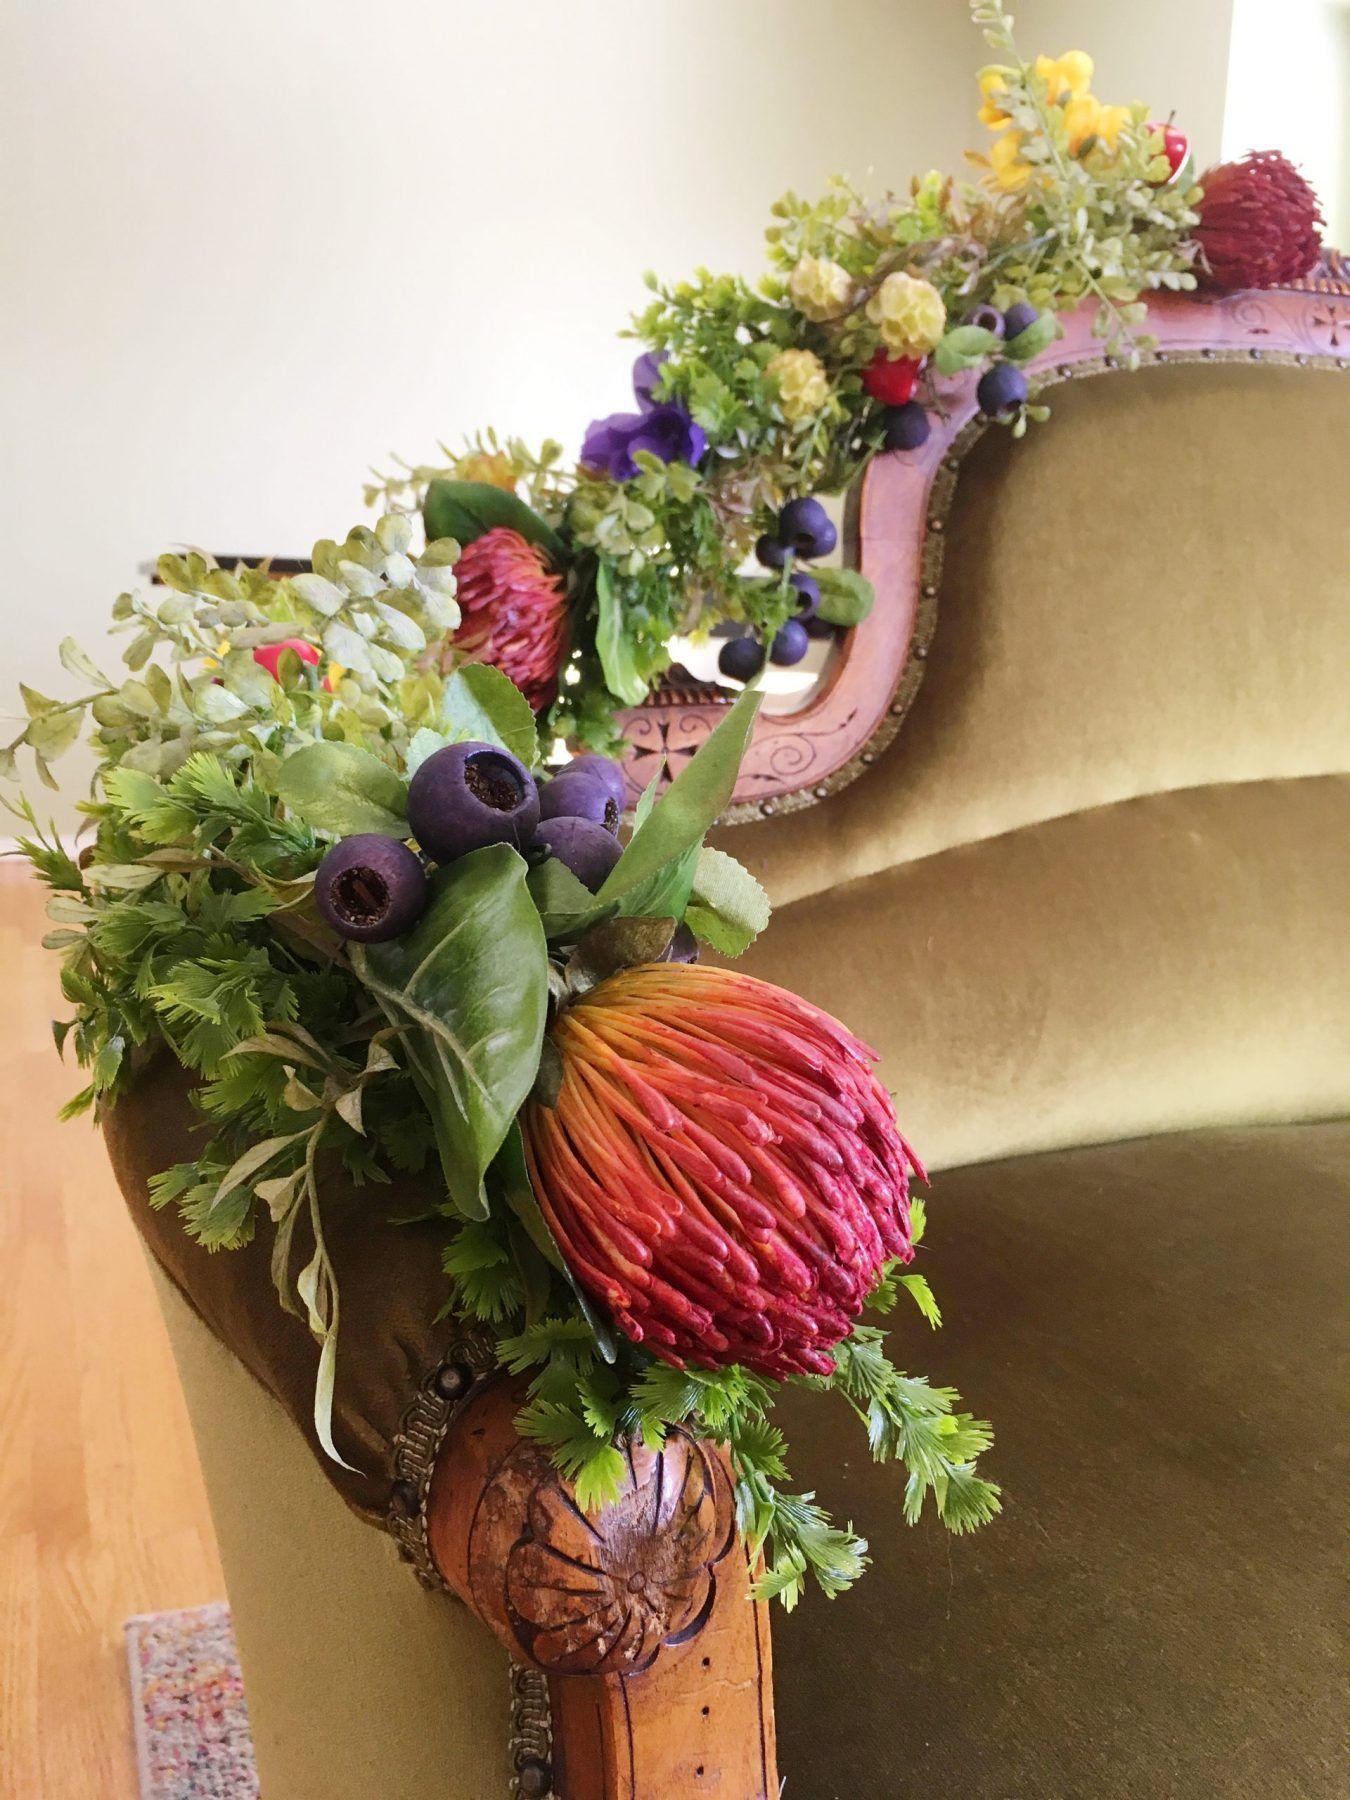 DIY Silk Flower & Greenery Garlands [Tutorial] Greenery